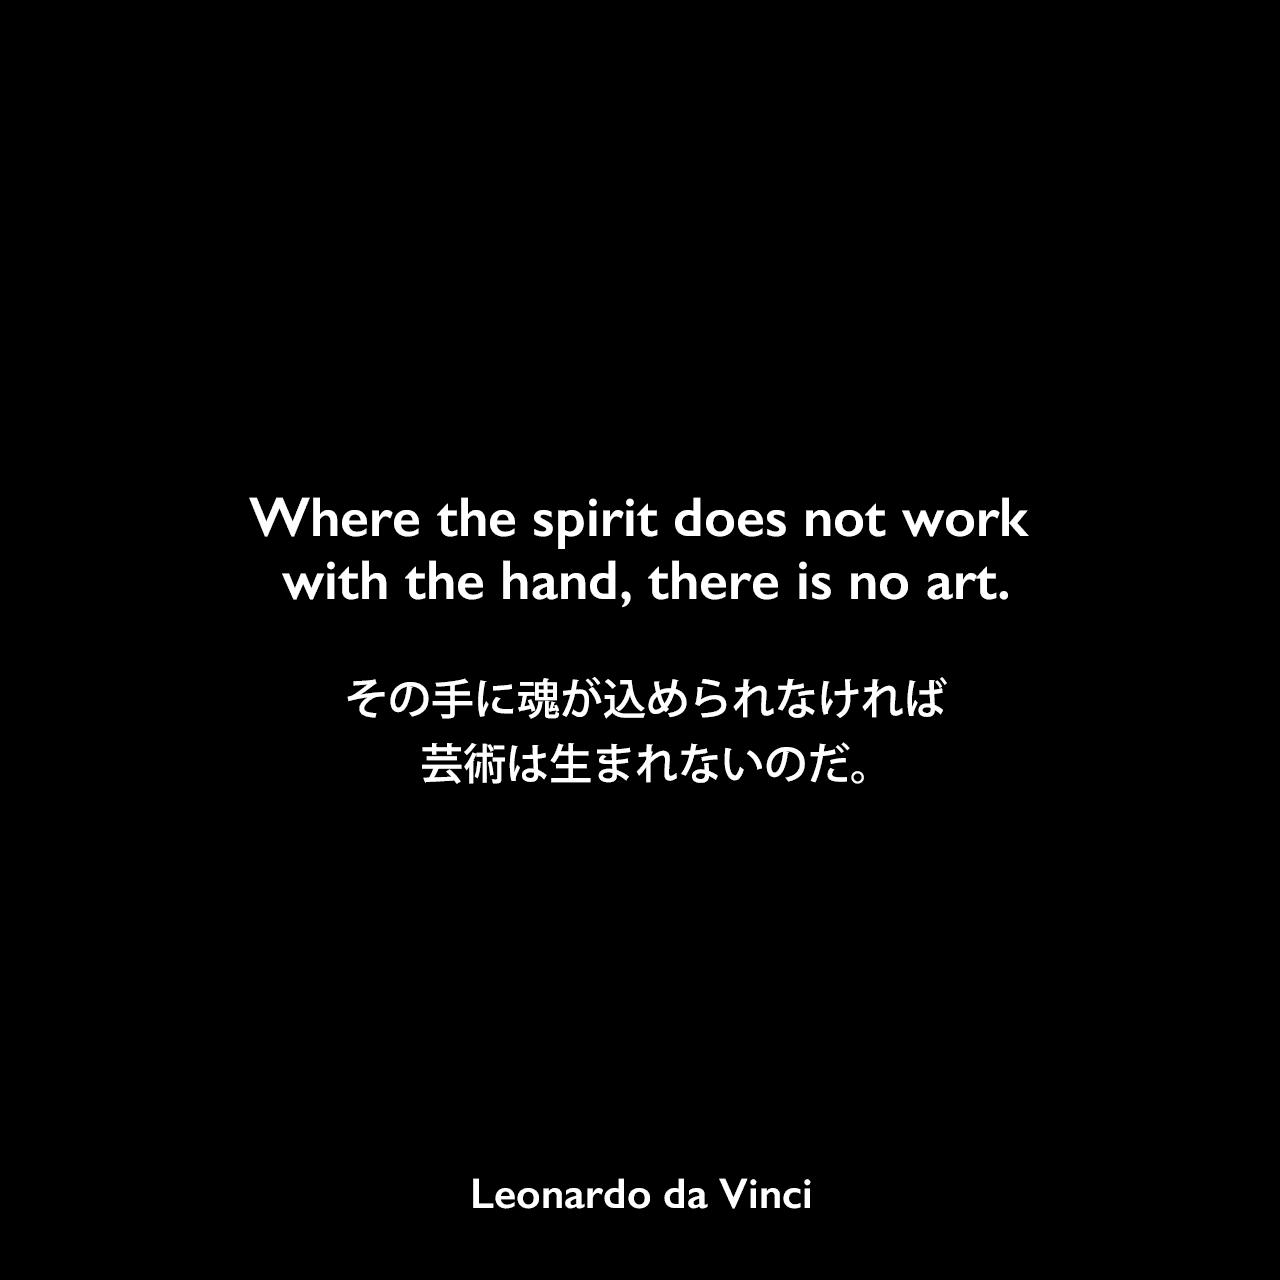 Where the spirit does not work with the hand, there is no art.その手に魂が込められなければ、芸術は生まれないのだ。Leonardo da Vinci